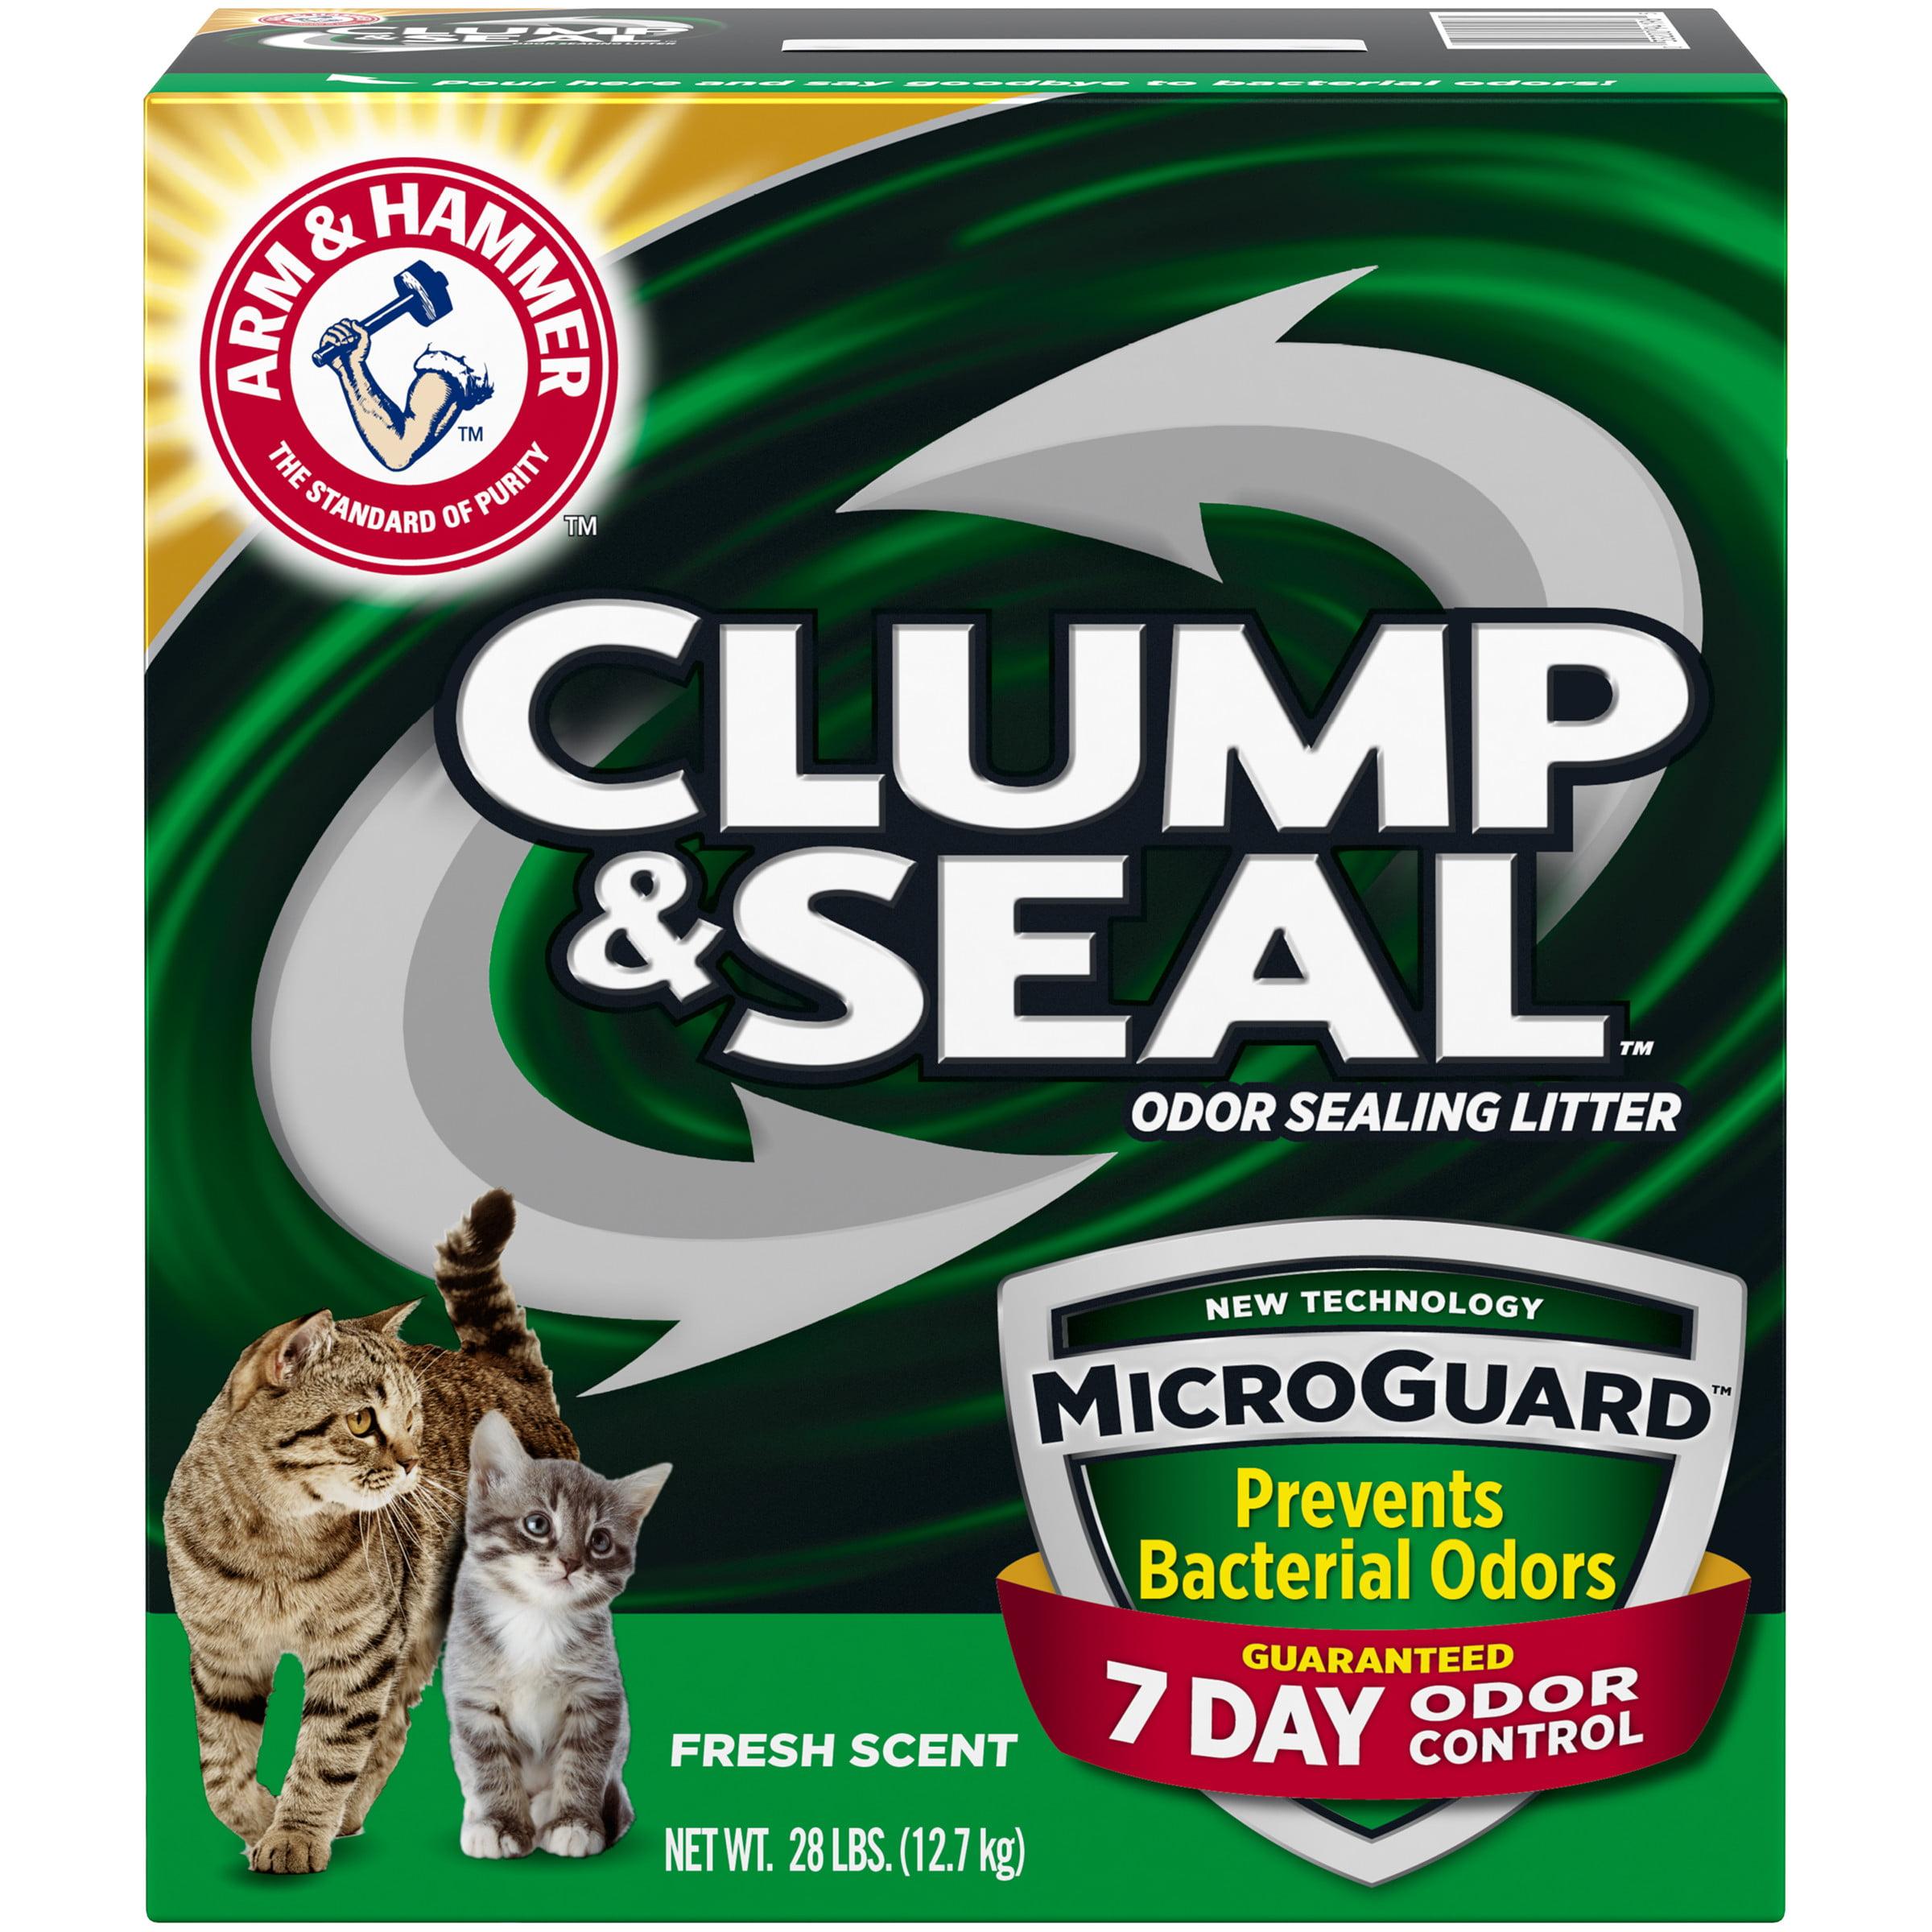 ARM & HAMMER Clump & Seal MicroGuard Litter, 28lb